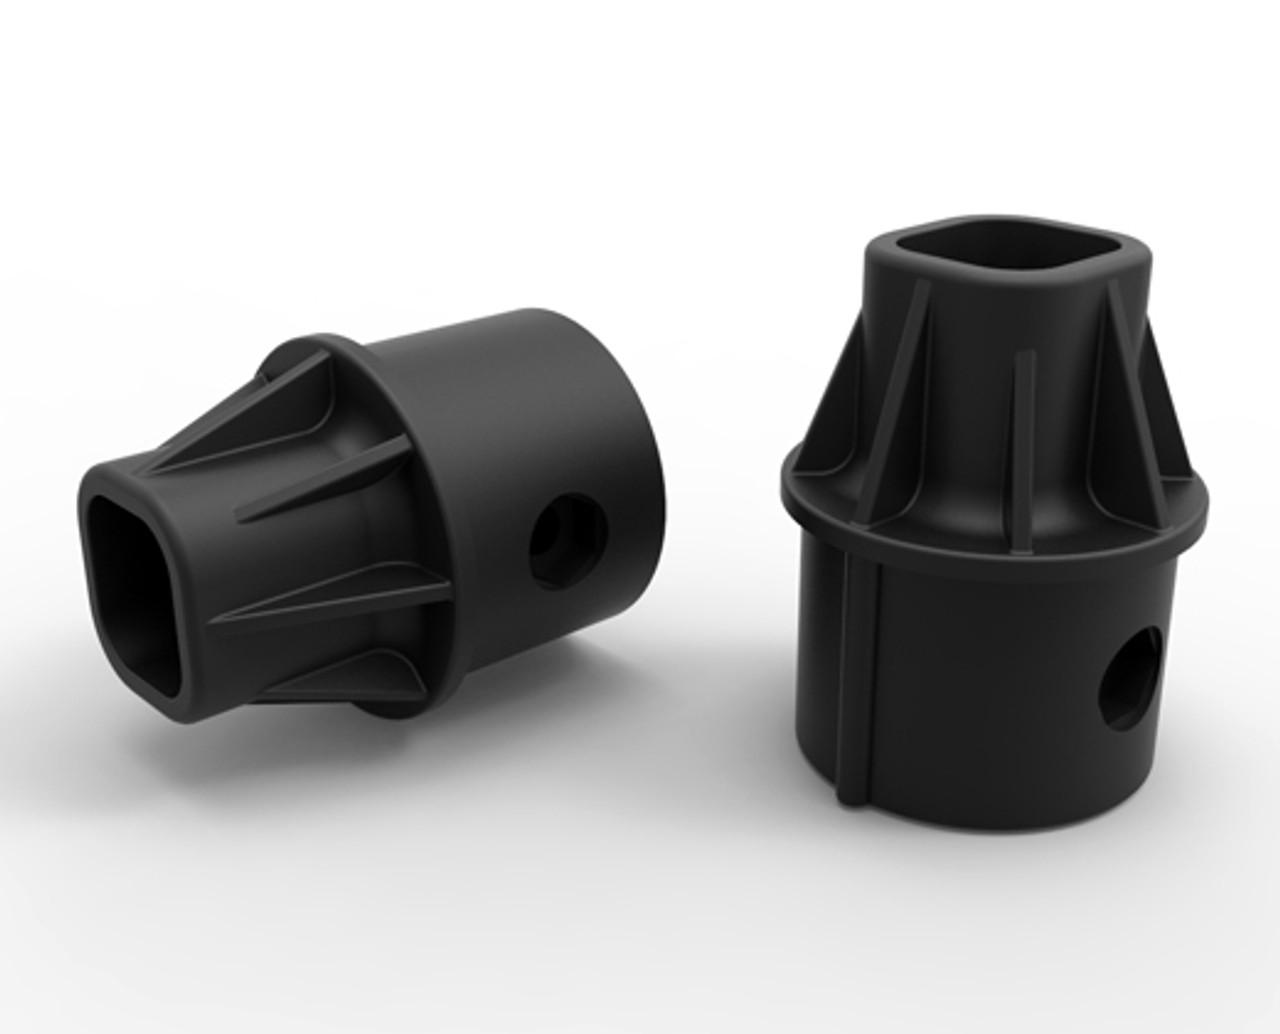 B&T Tailhook Adapter